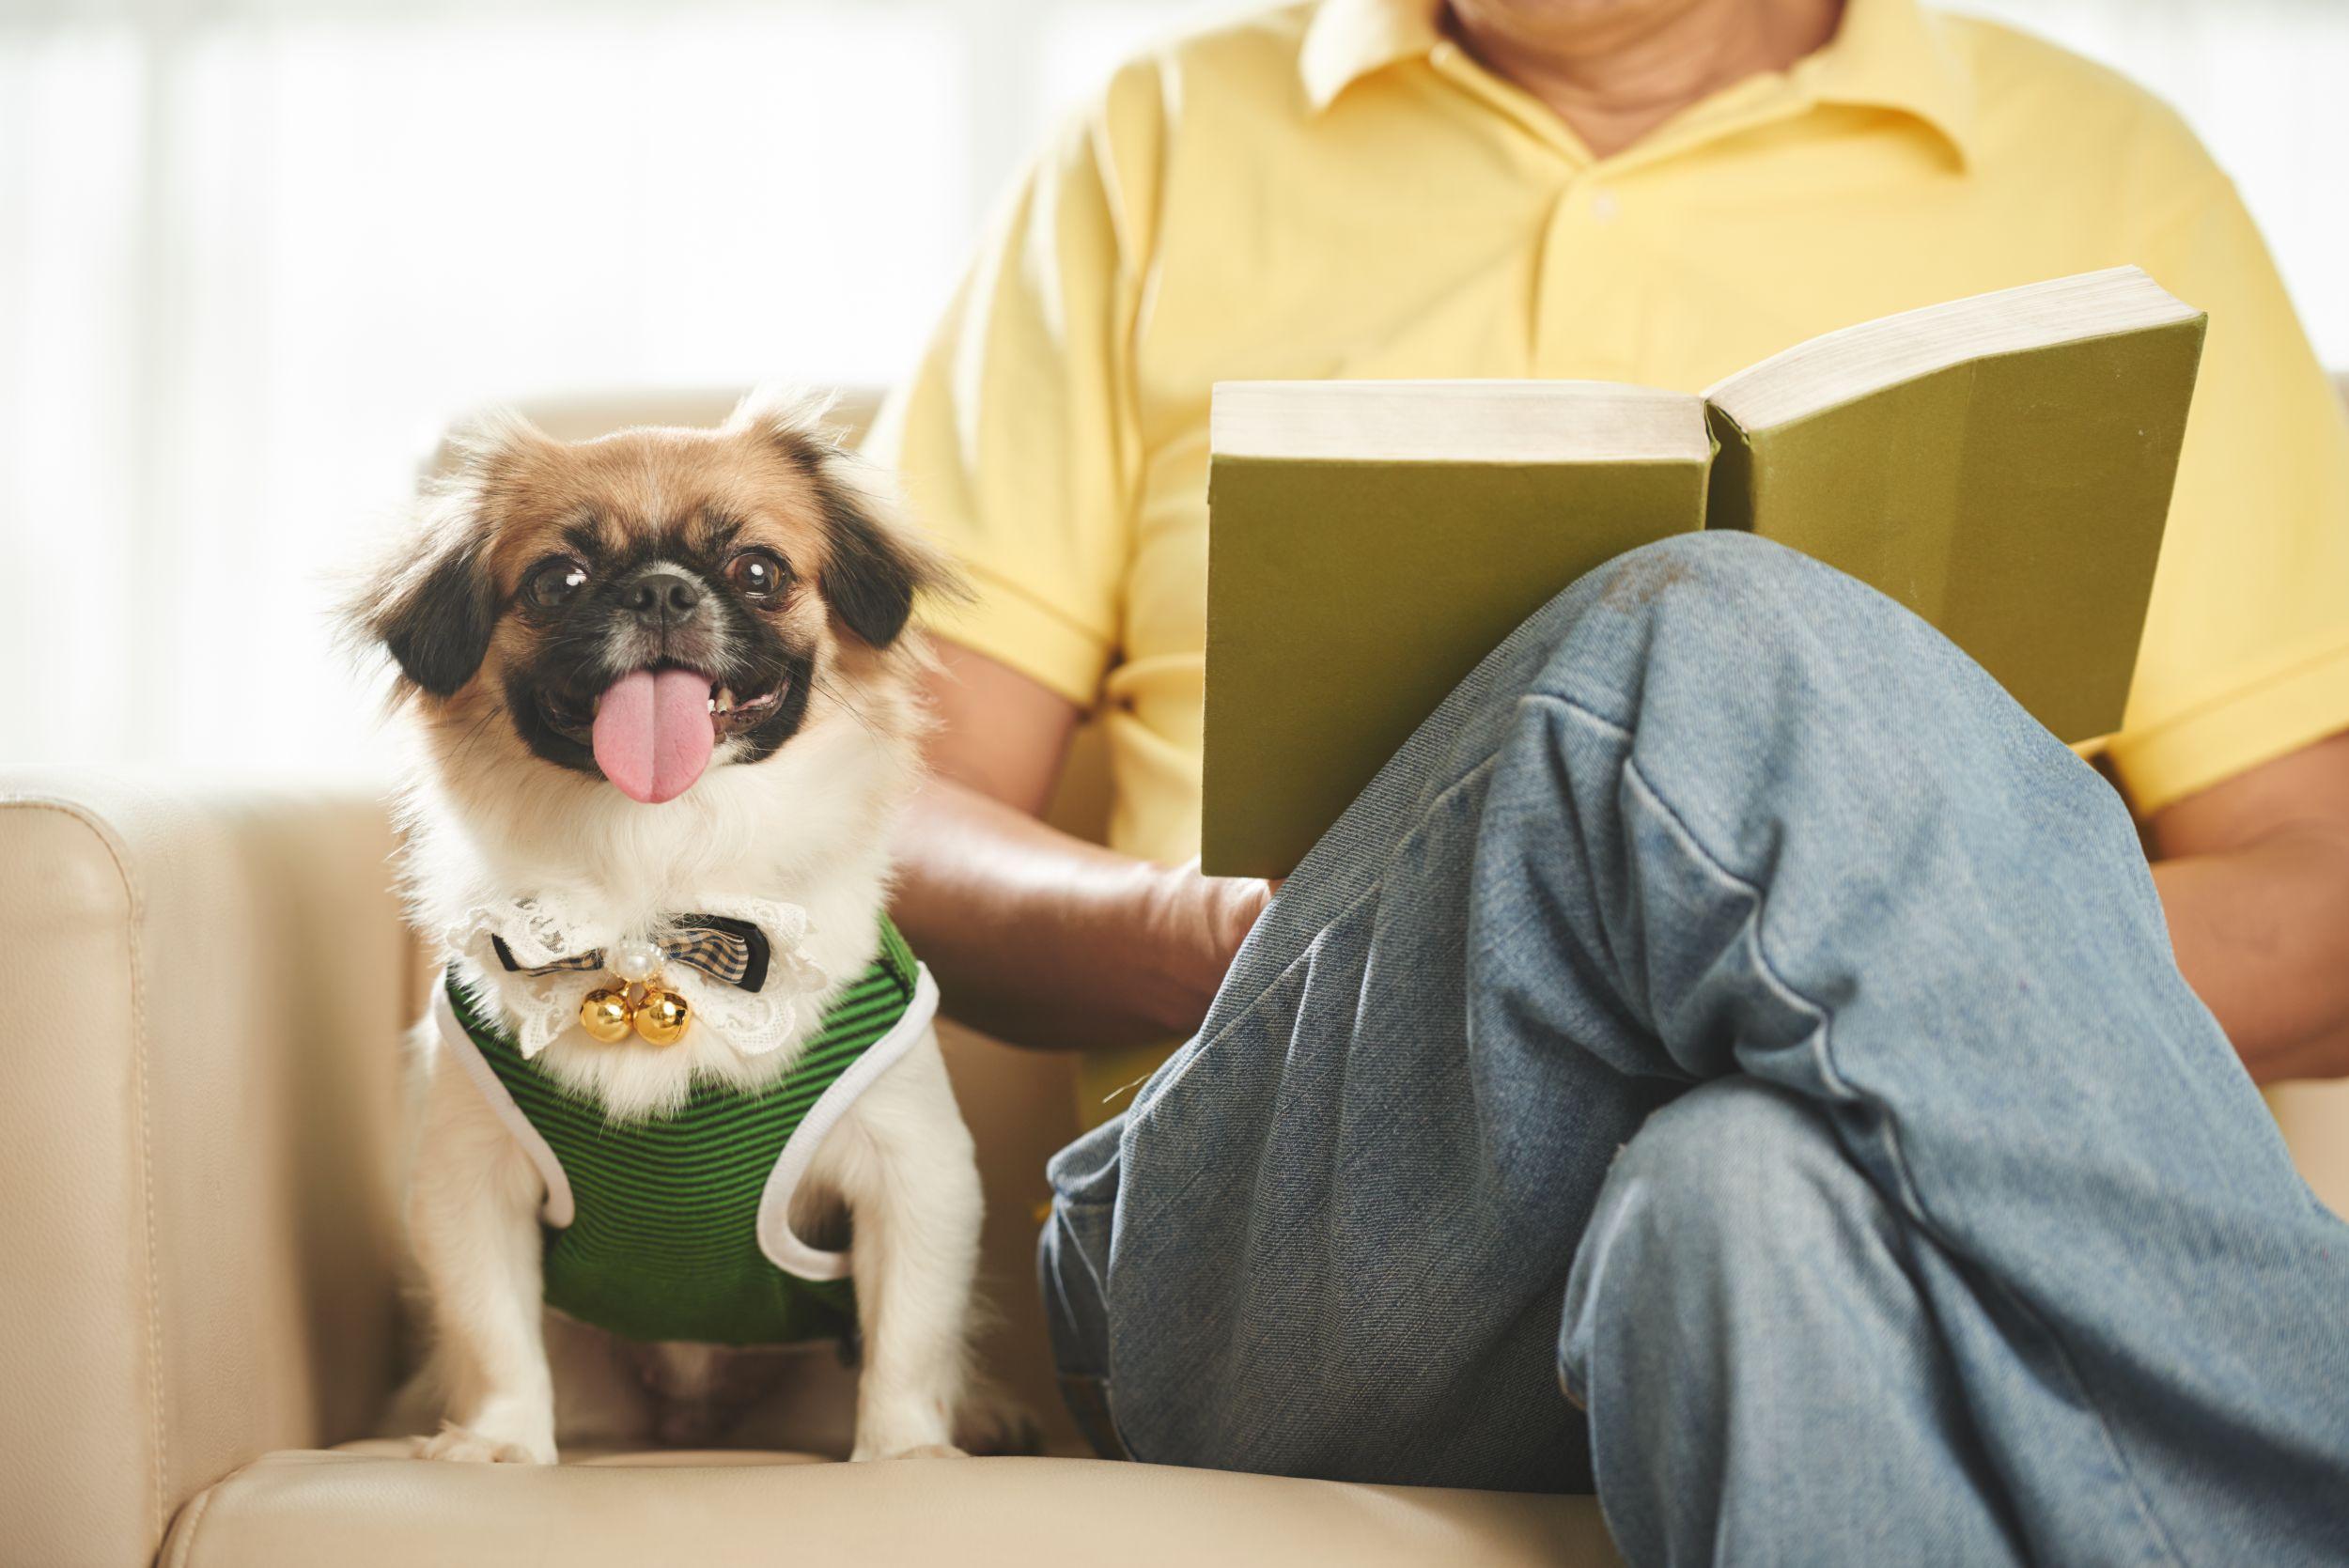 Dogilike.com :: เลี้ยงน้องหมาแบบ New Normal ... แฮปปี้ชีวิตดีทั้งเจ้าของ ทั้งน้องหมา